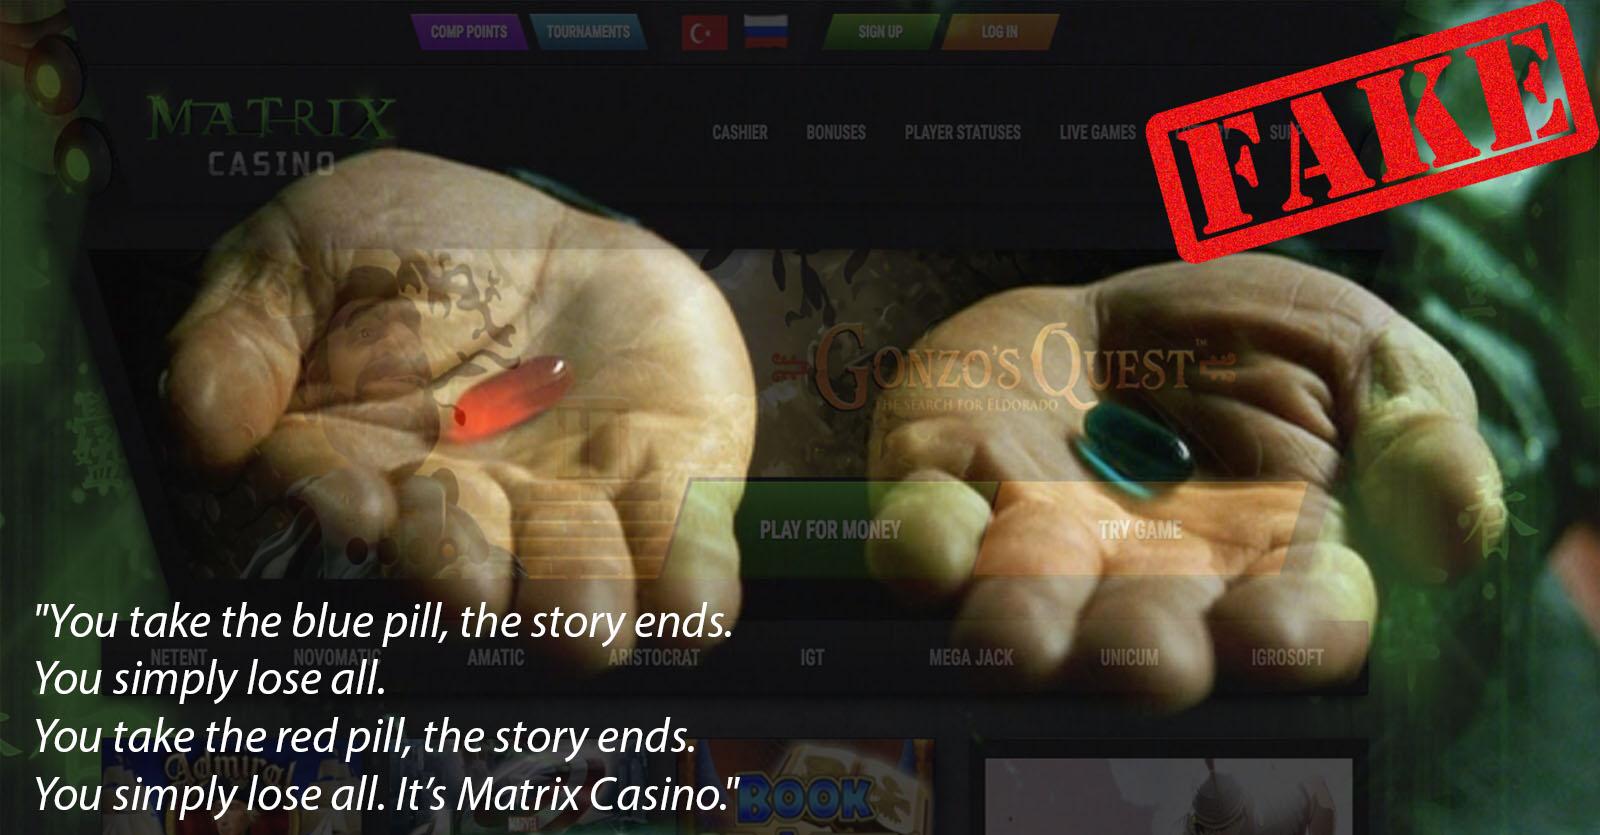 Fake Games at Matrix Casino